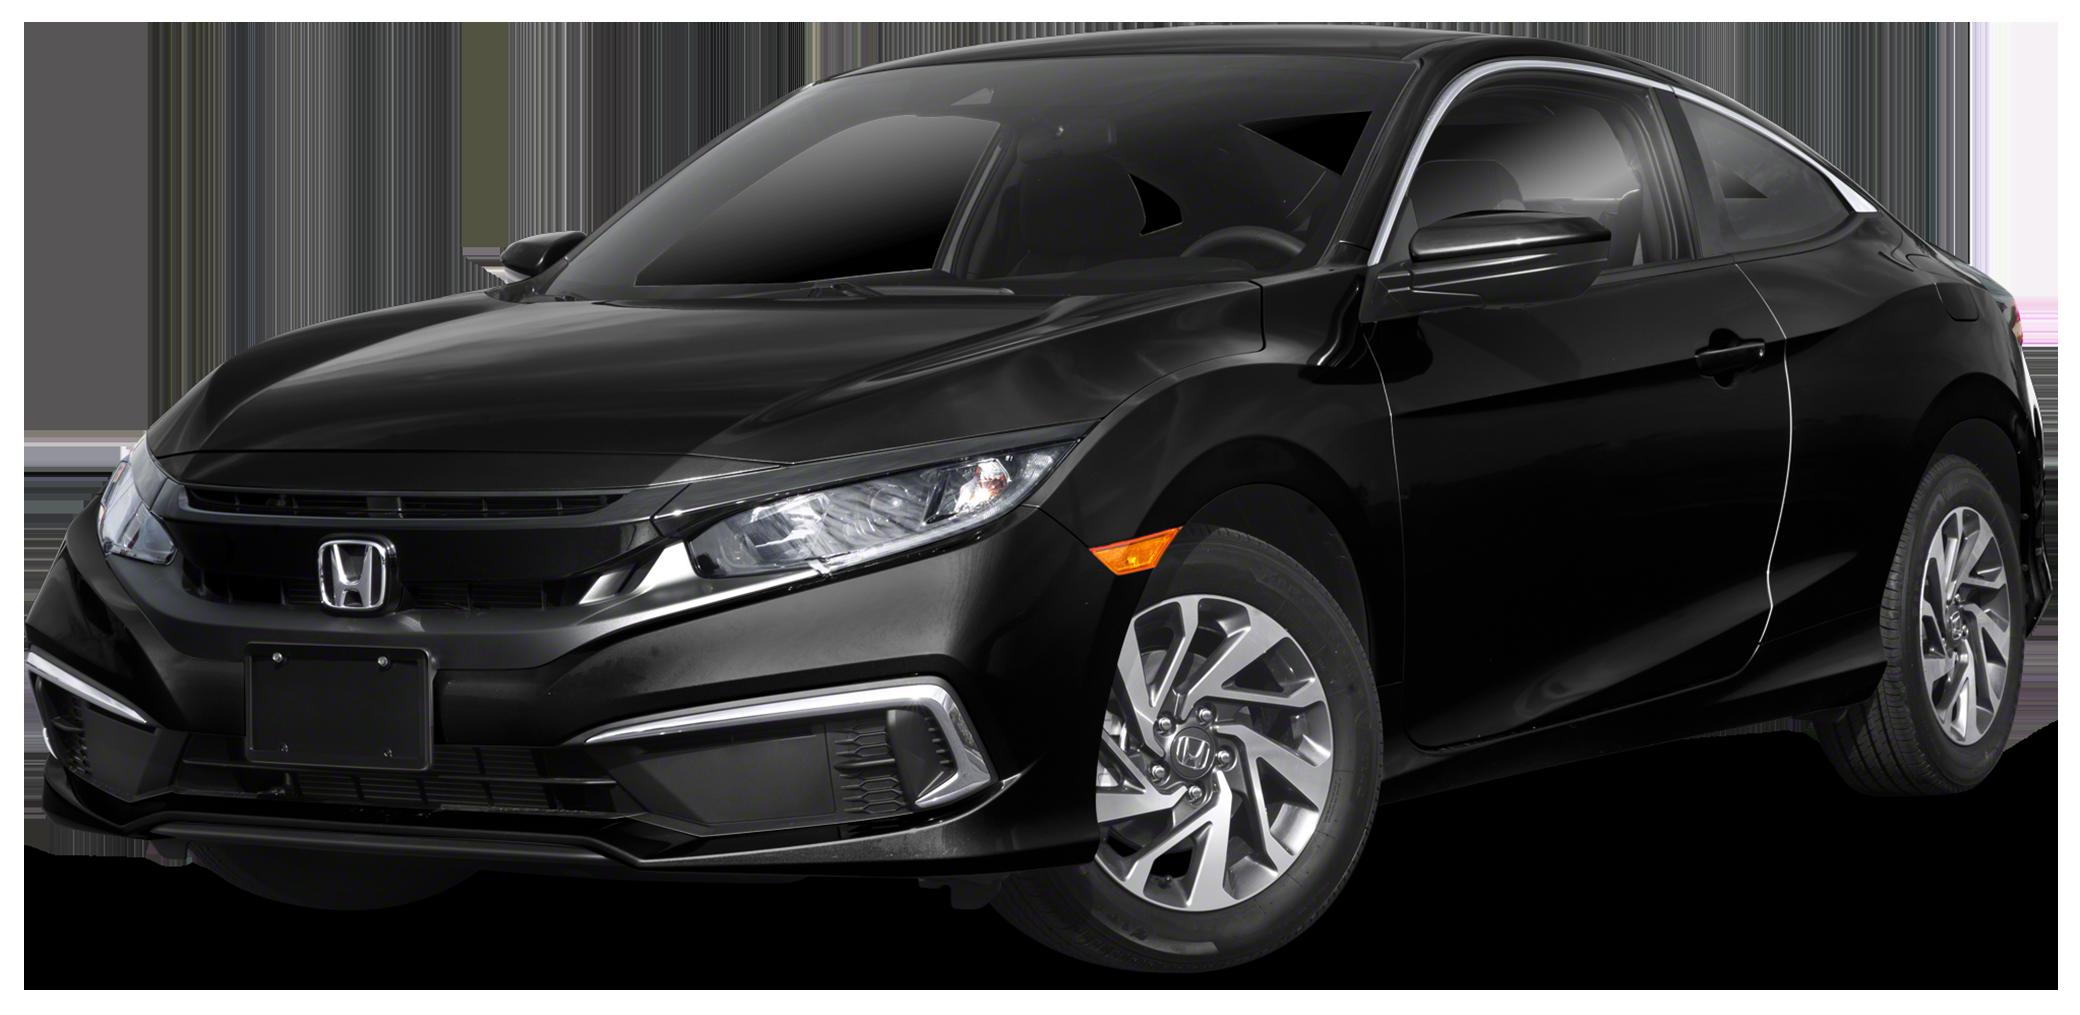 honda dealer port richey fl  honda certified  pre owned car dealership serving